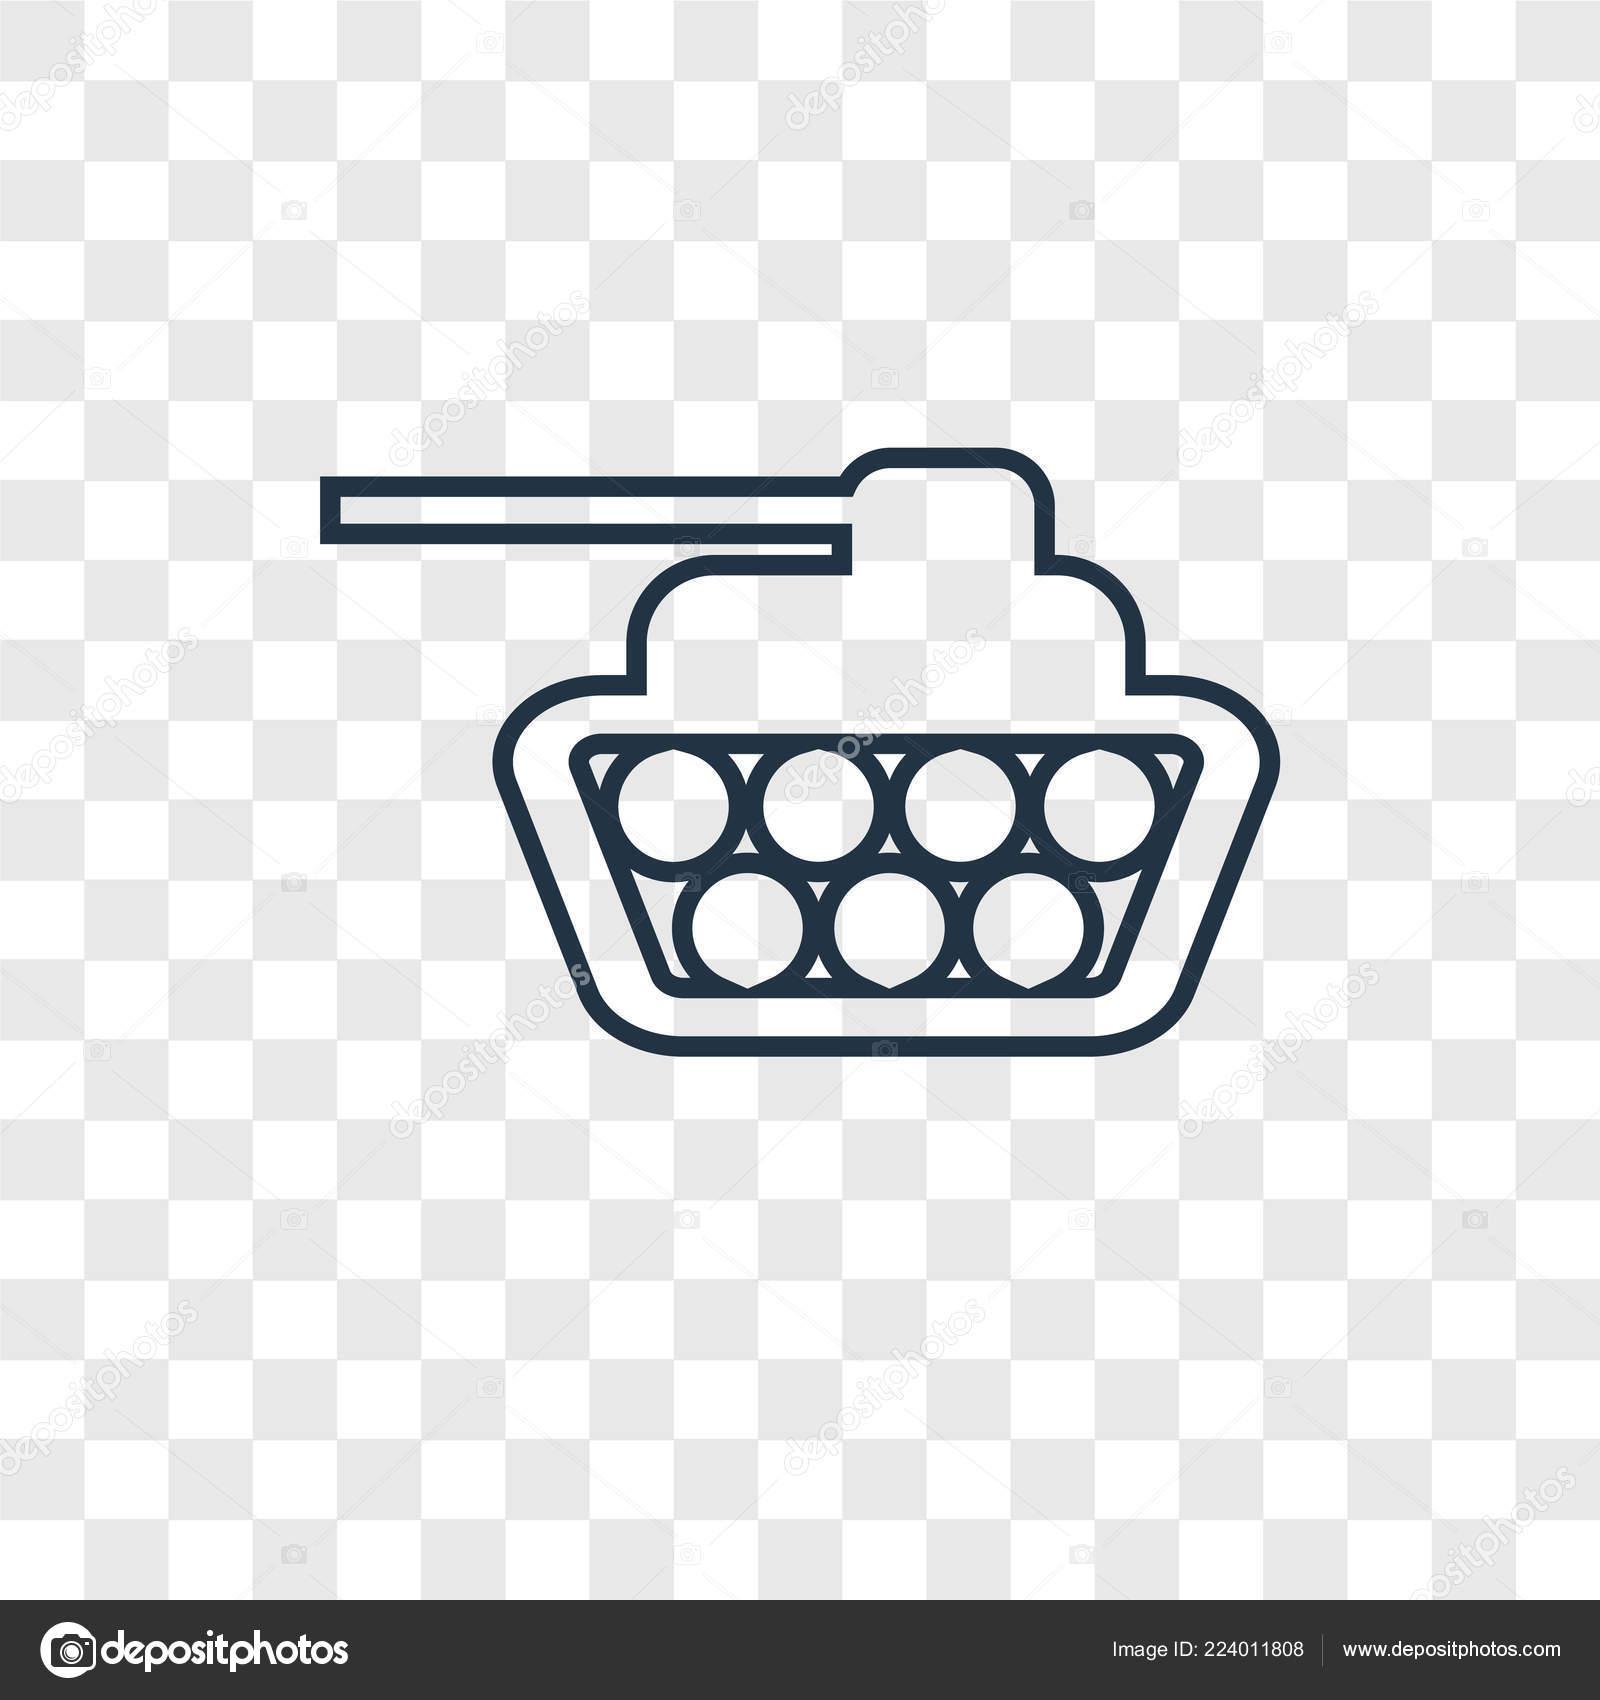 tank icon trendy design style tank icon isolated transparent background stock vector c topvectorstock 224011808 https depositphotos com 224011808 stock illustration tank concept vector linear icon html